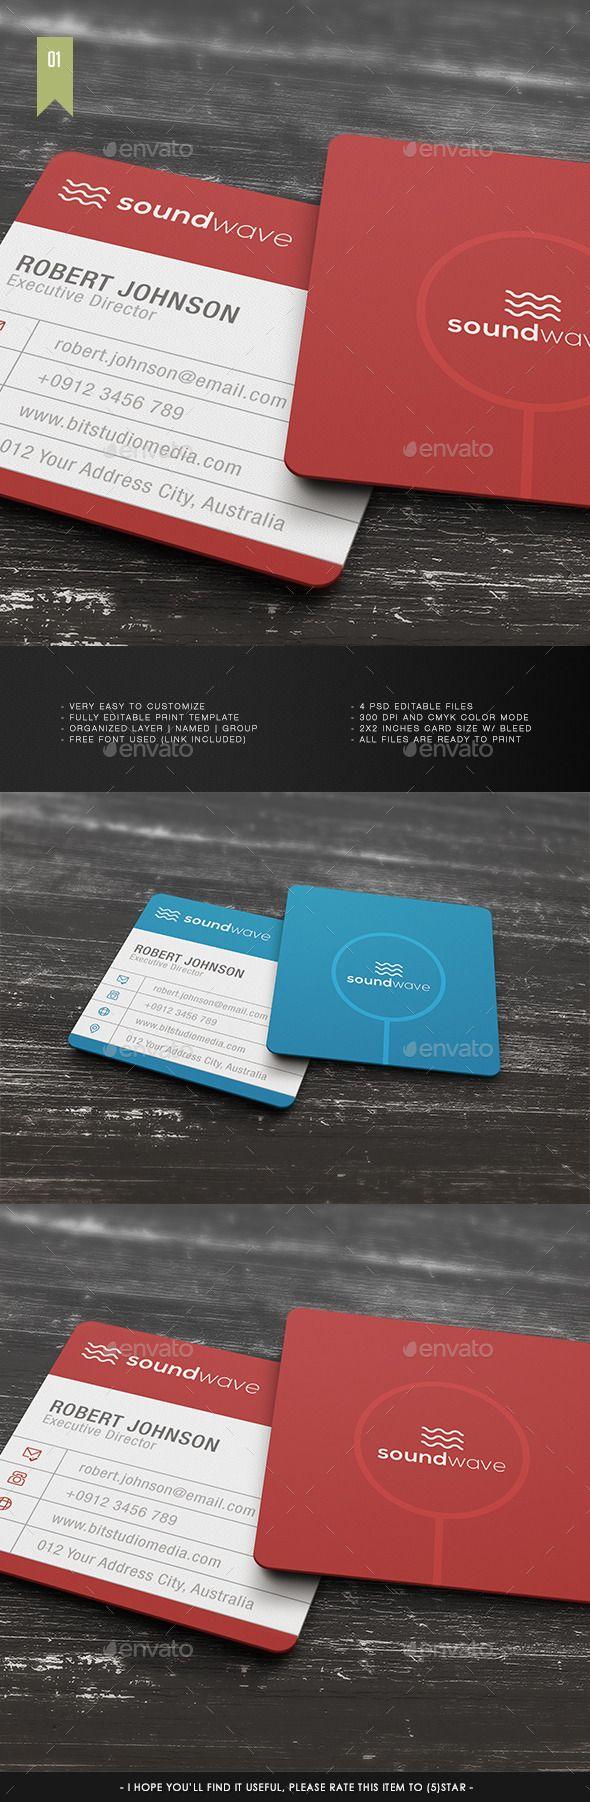 Square Business Card V 001 Square Business Card Printable Business Cards Corporate Business Card